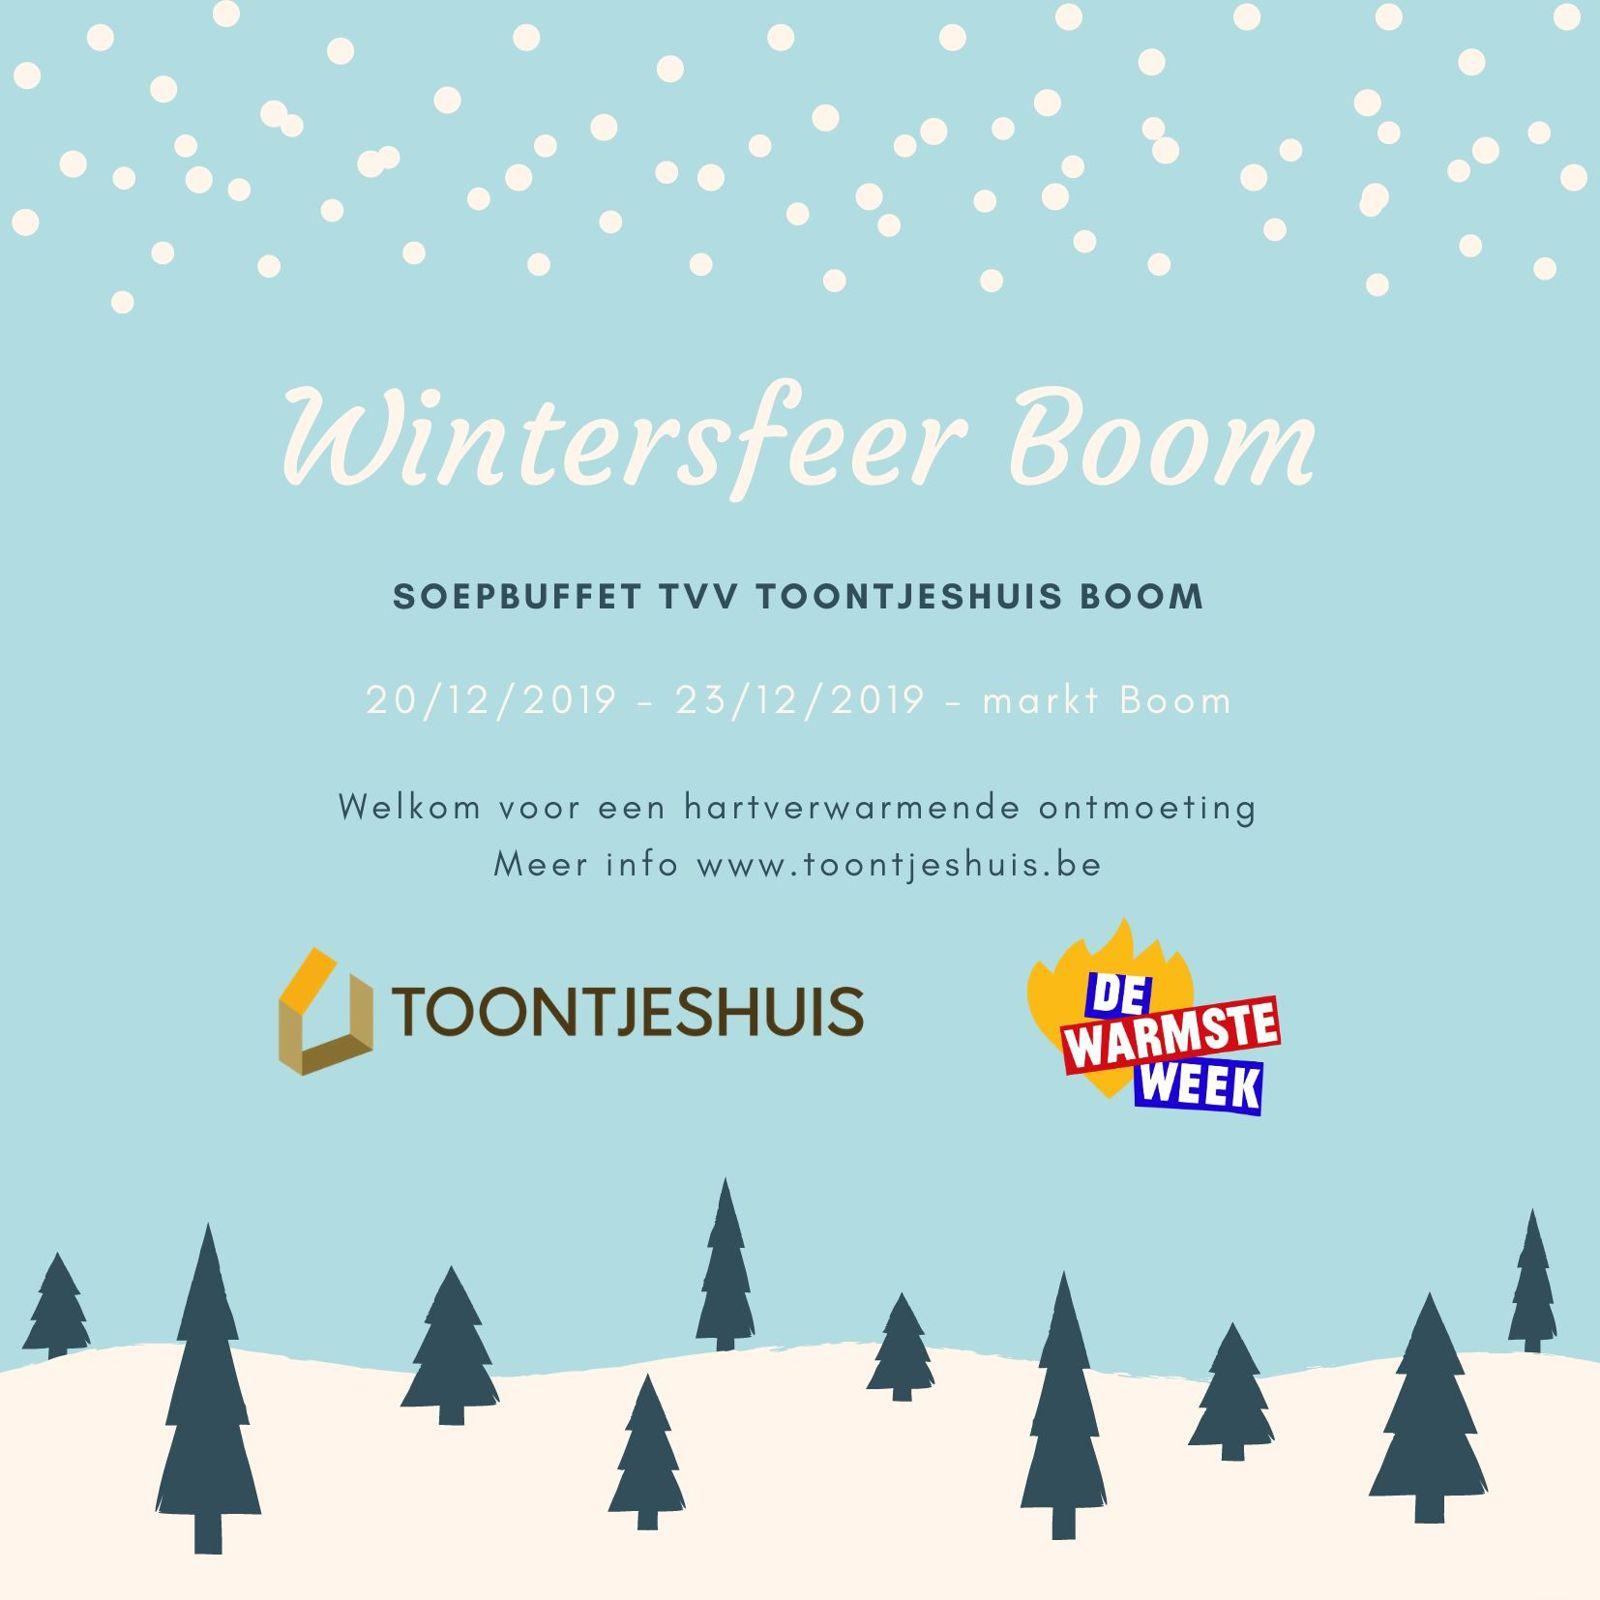 Wintersfeer Boom